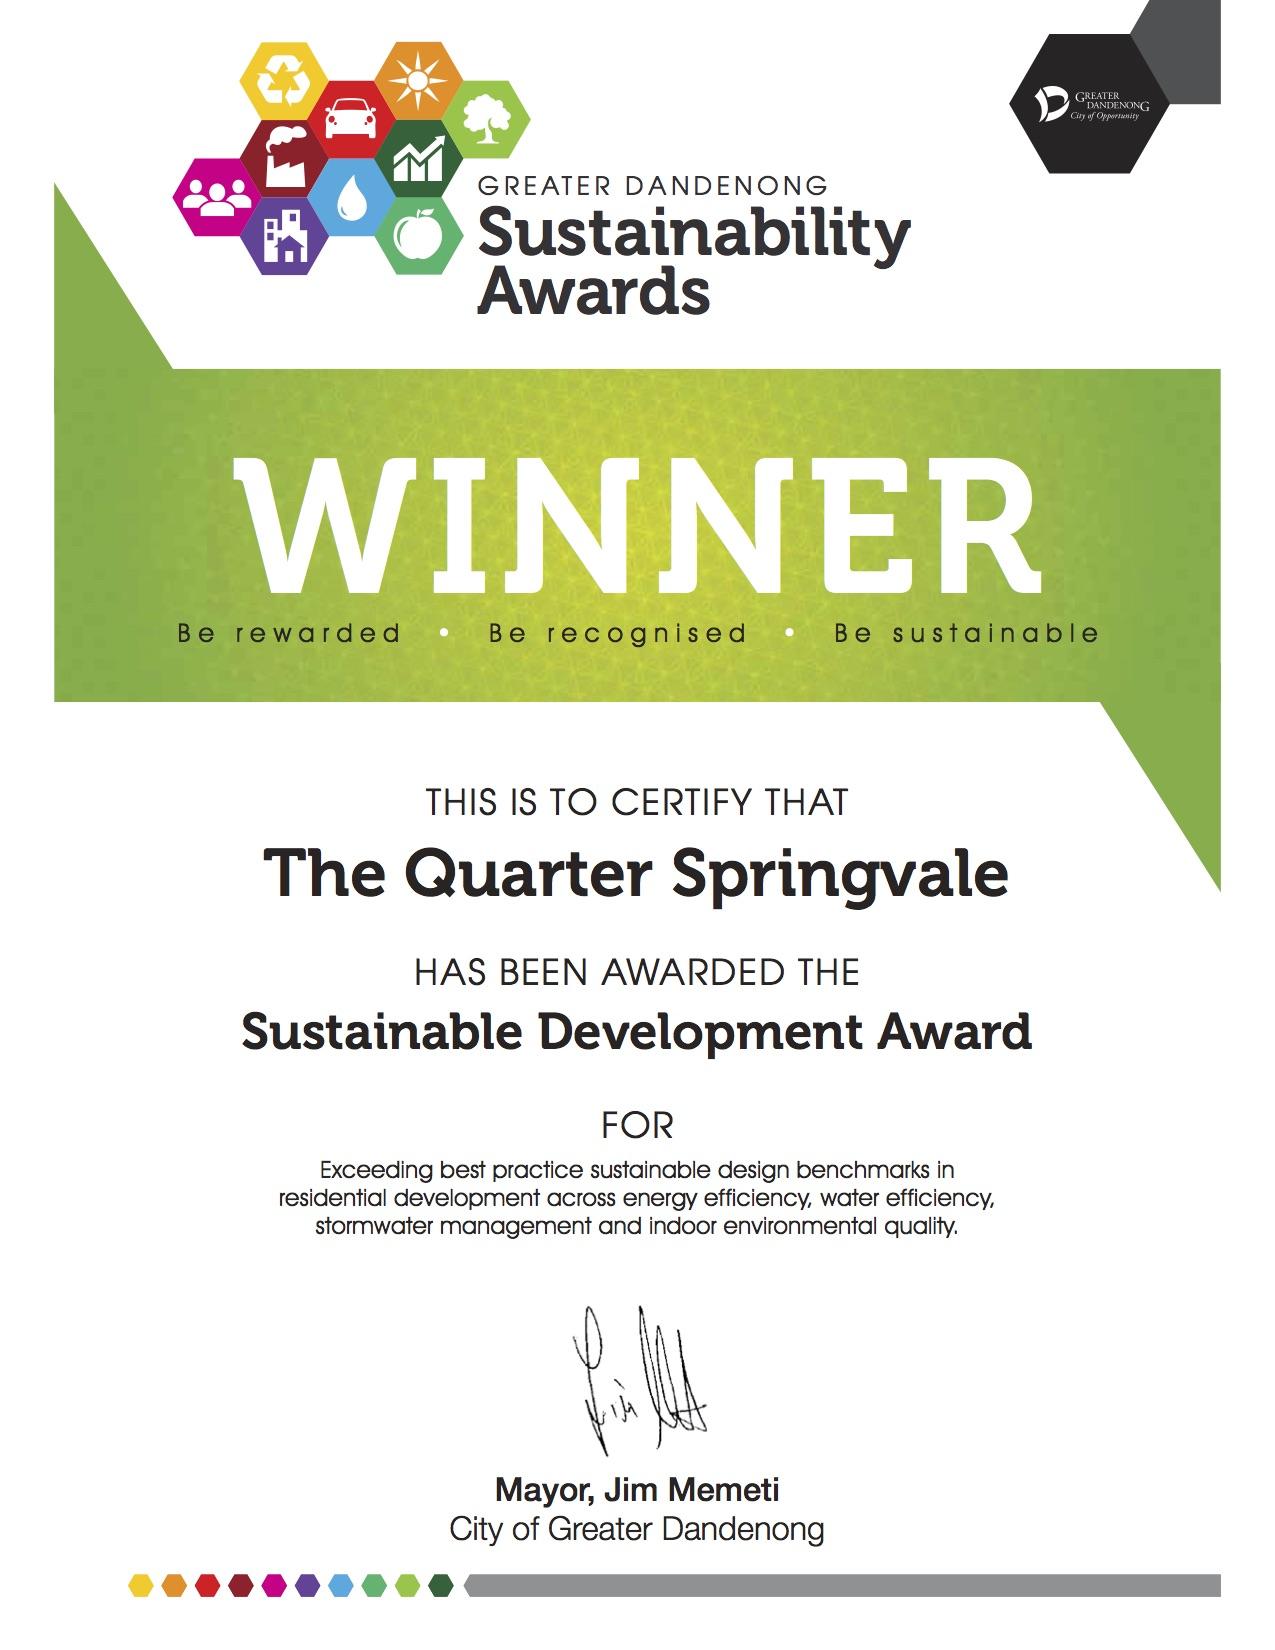 The Quarter Springvale Wins Sustainability Award